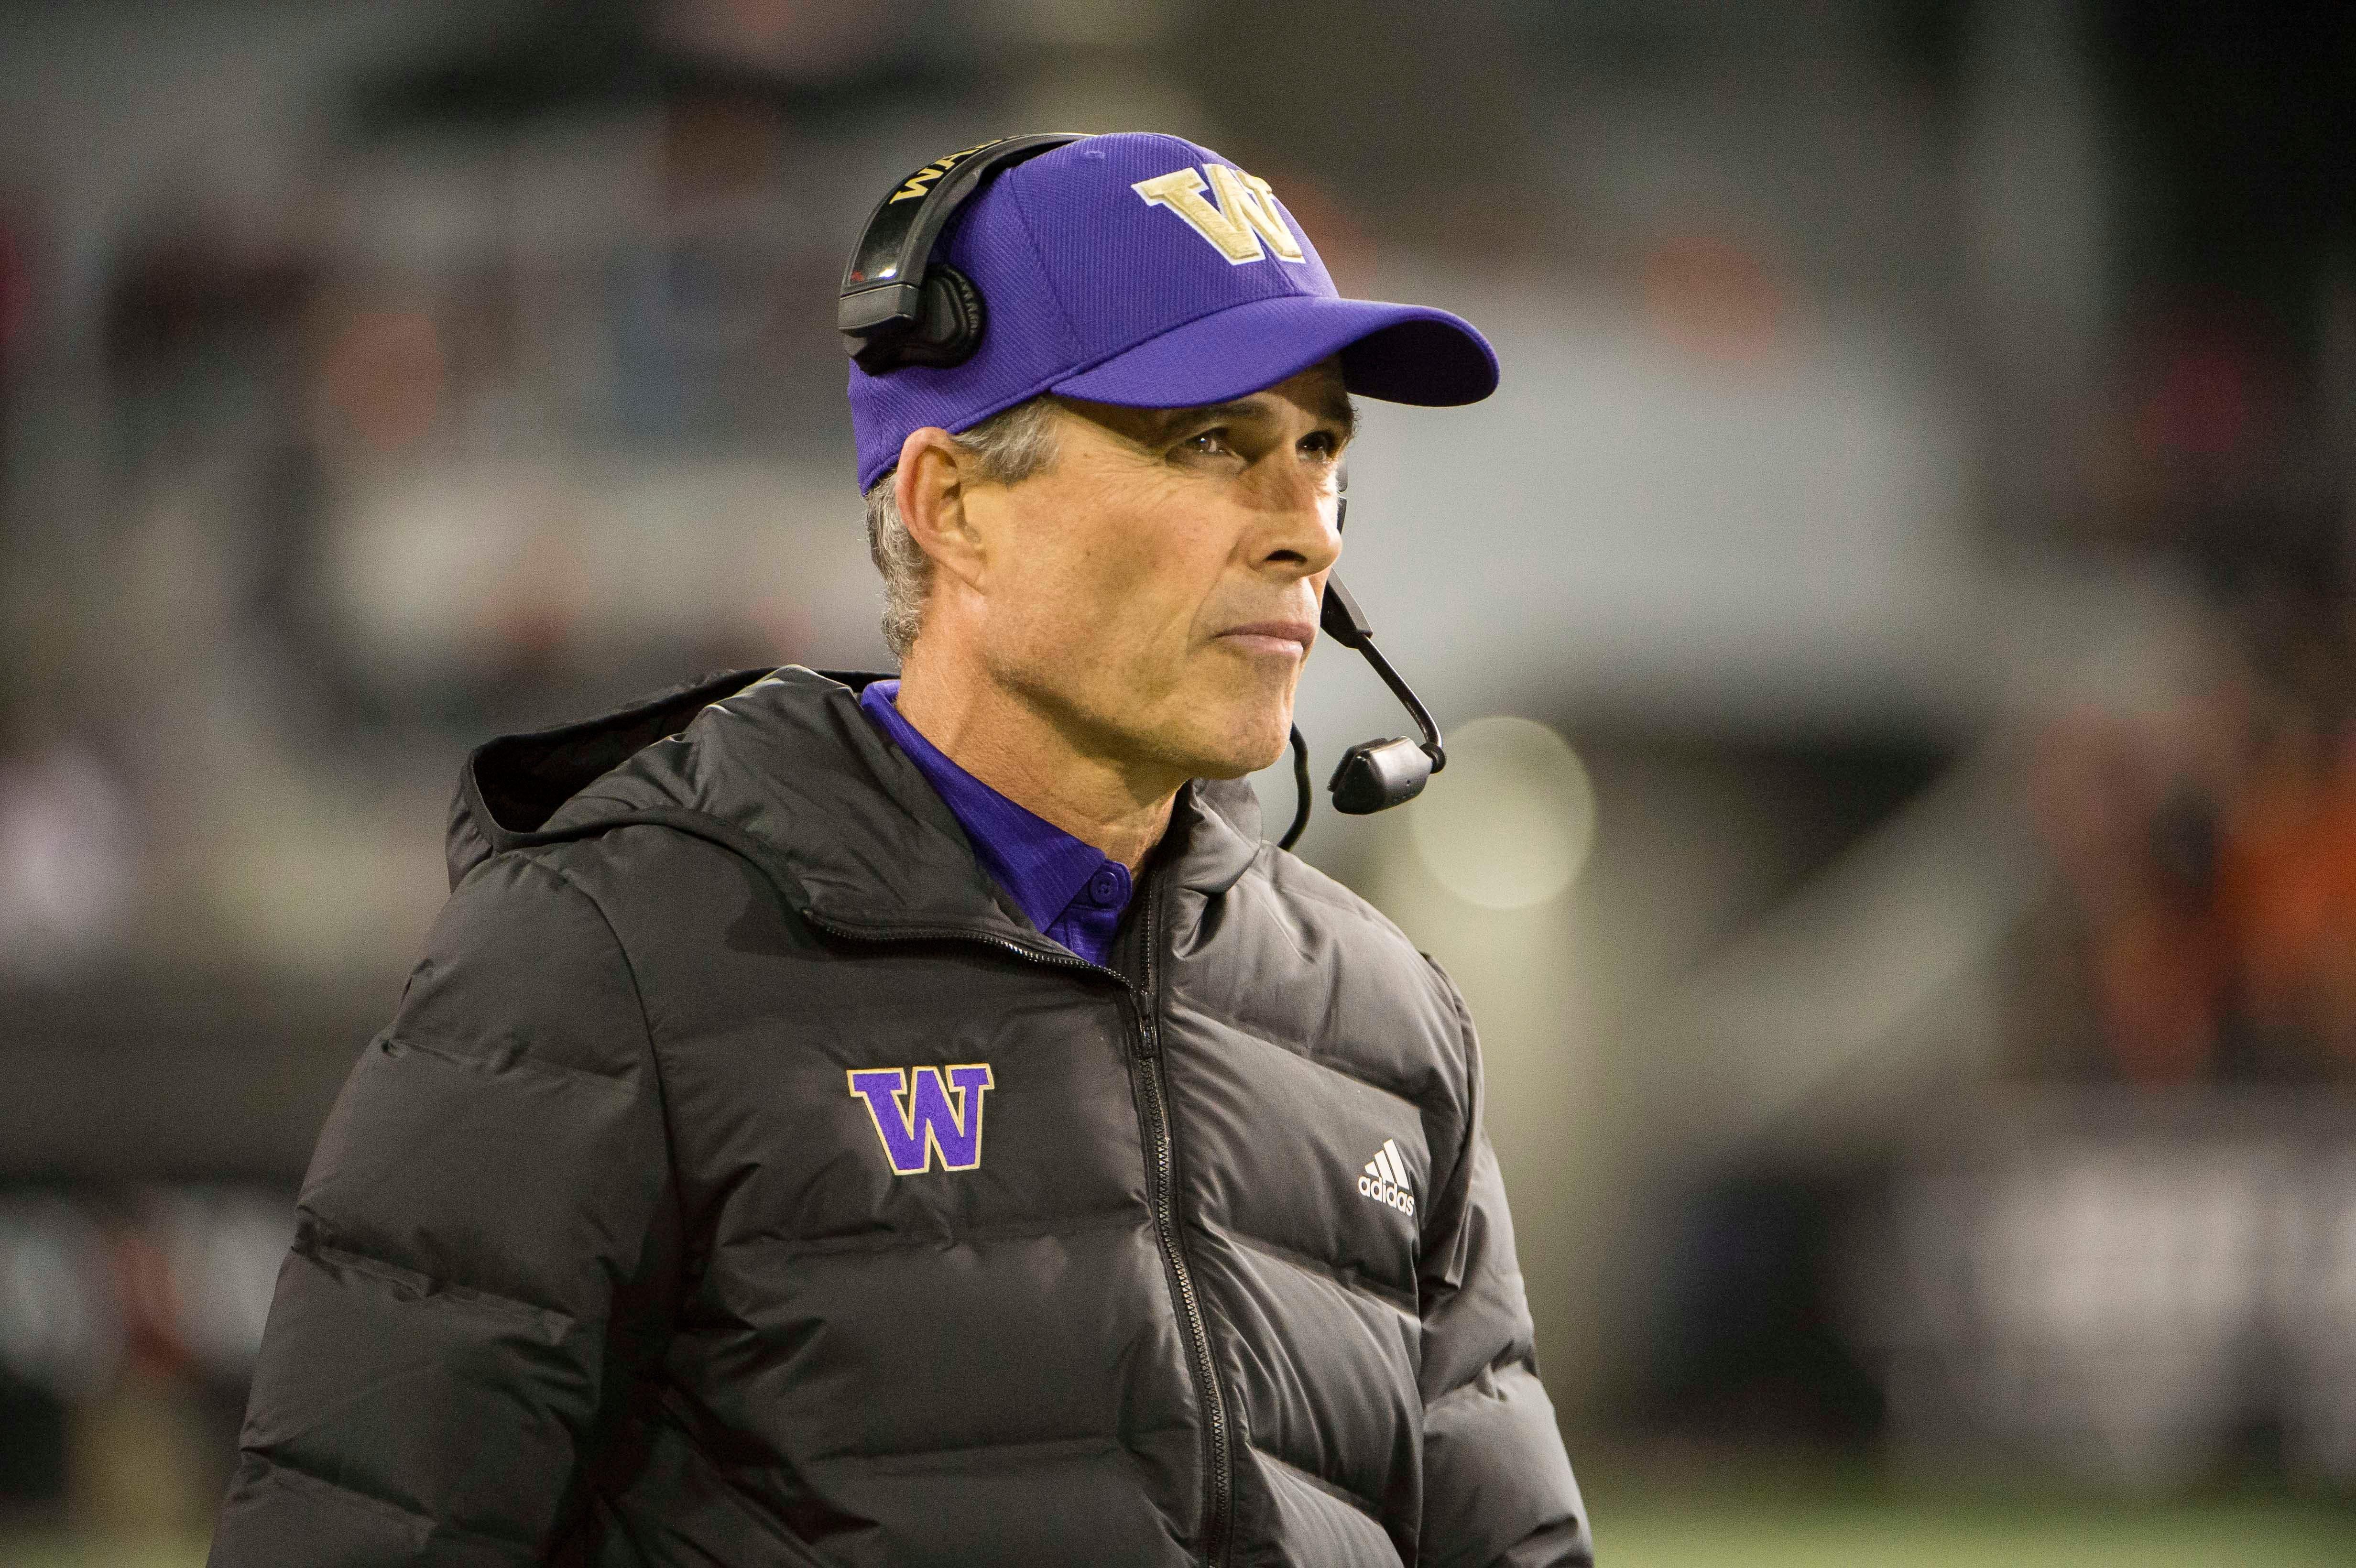 Opinion: Can you really blame Washington coach Chris Petersen for wanting to take a break?